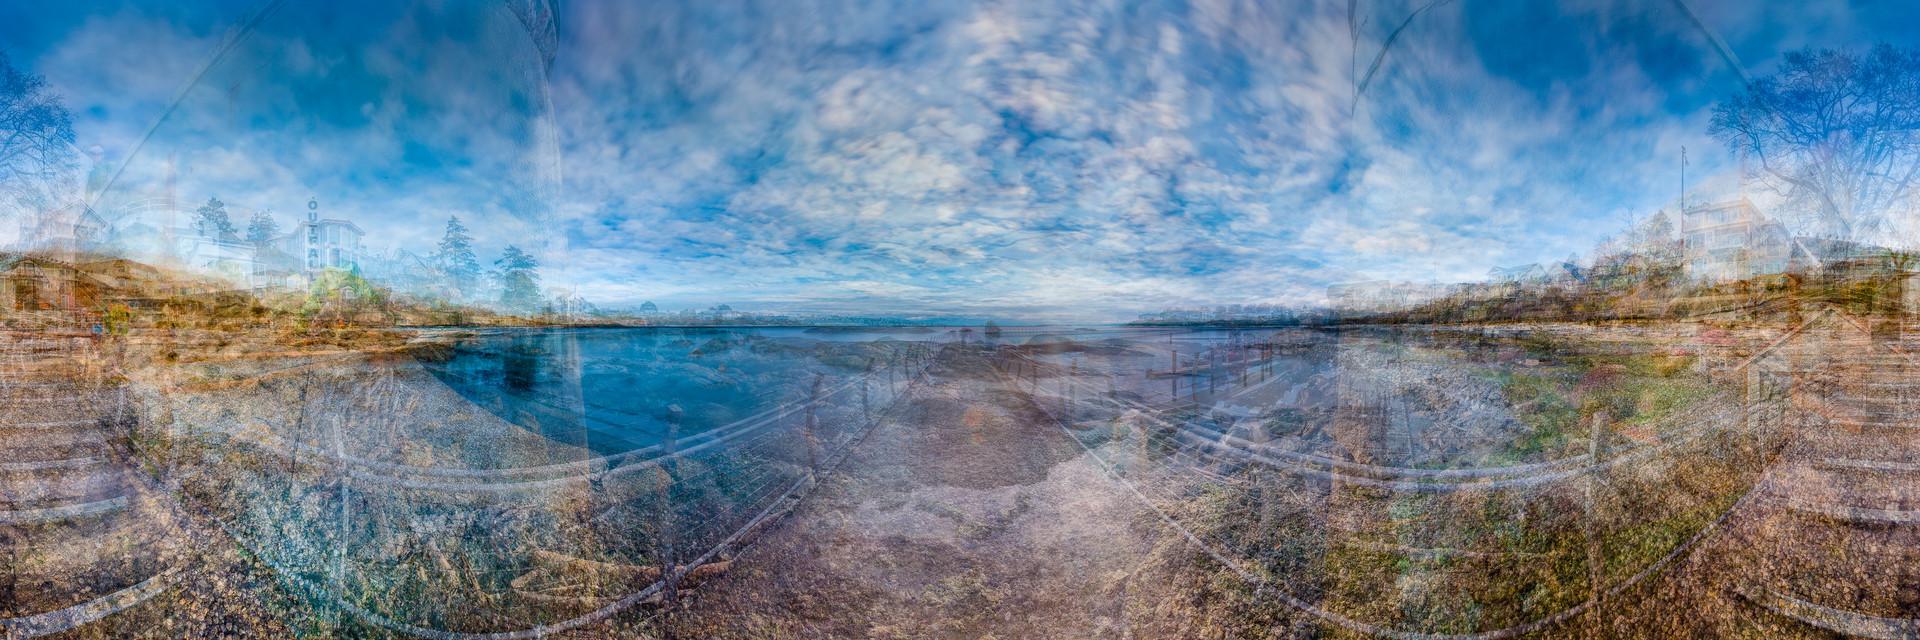 "The Ragged Edge: Strait of Juan de Fuca, Victoria, 2014, chromogenic print, 30"" x 90""   40/66"